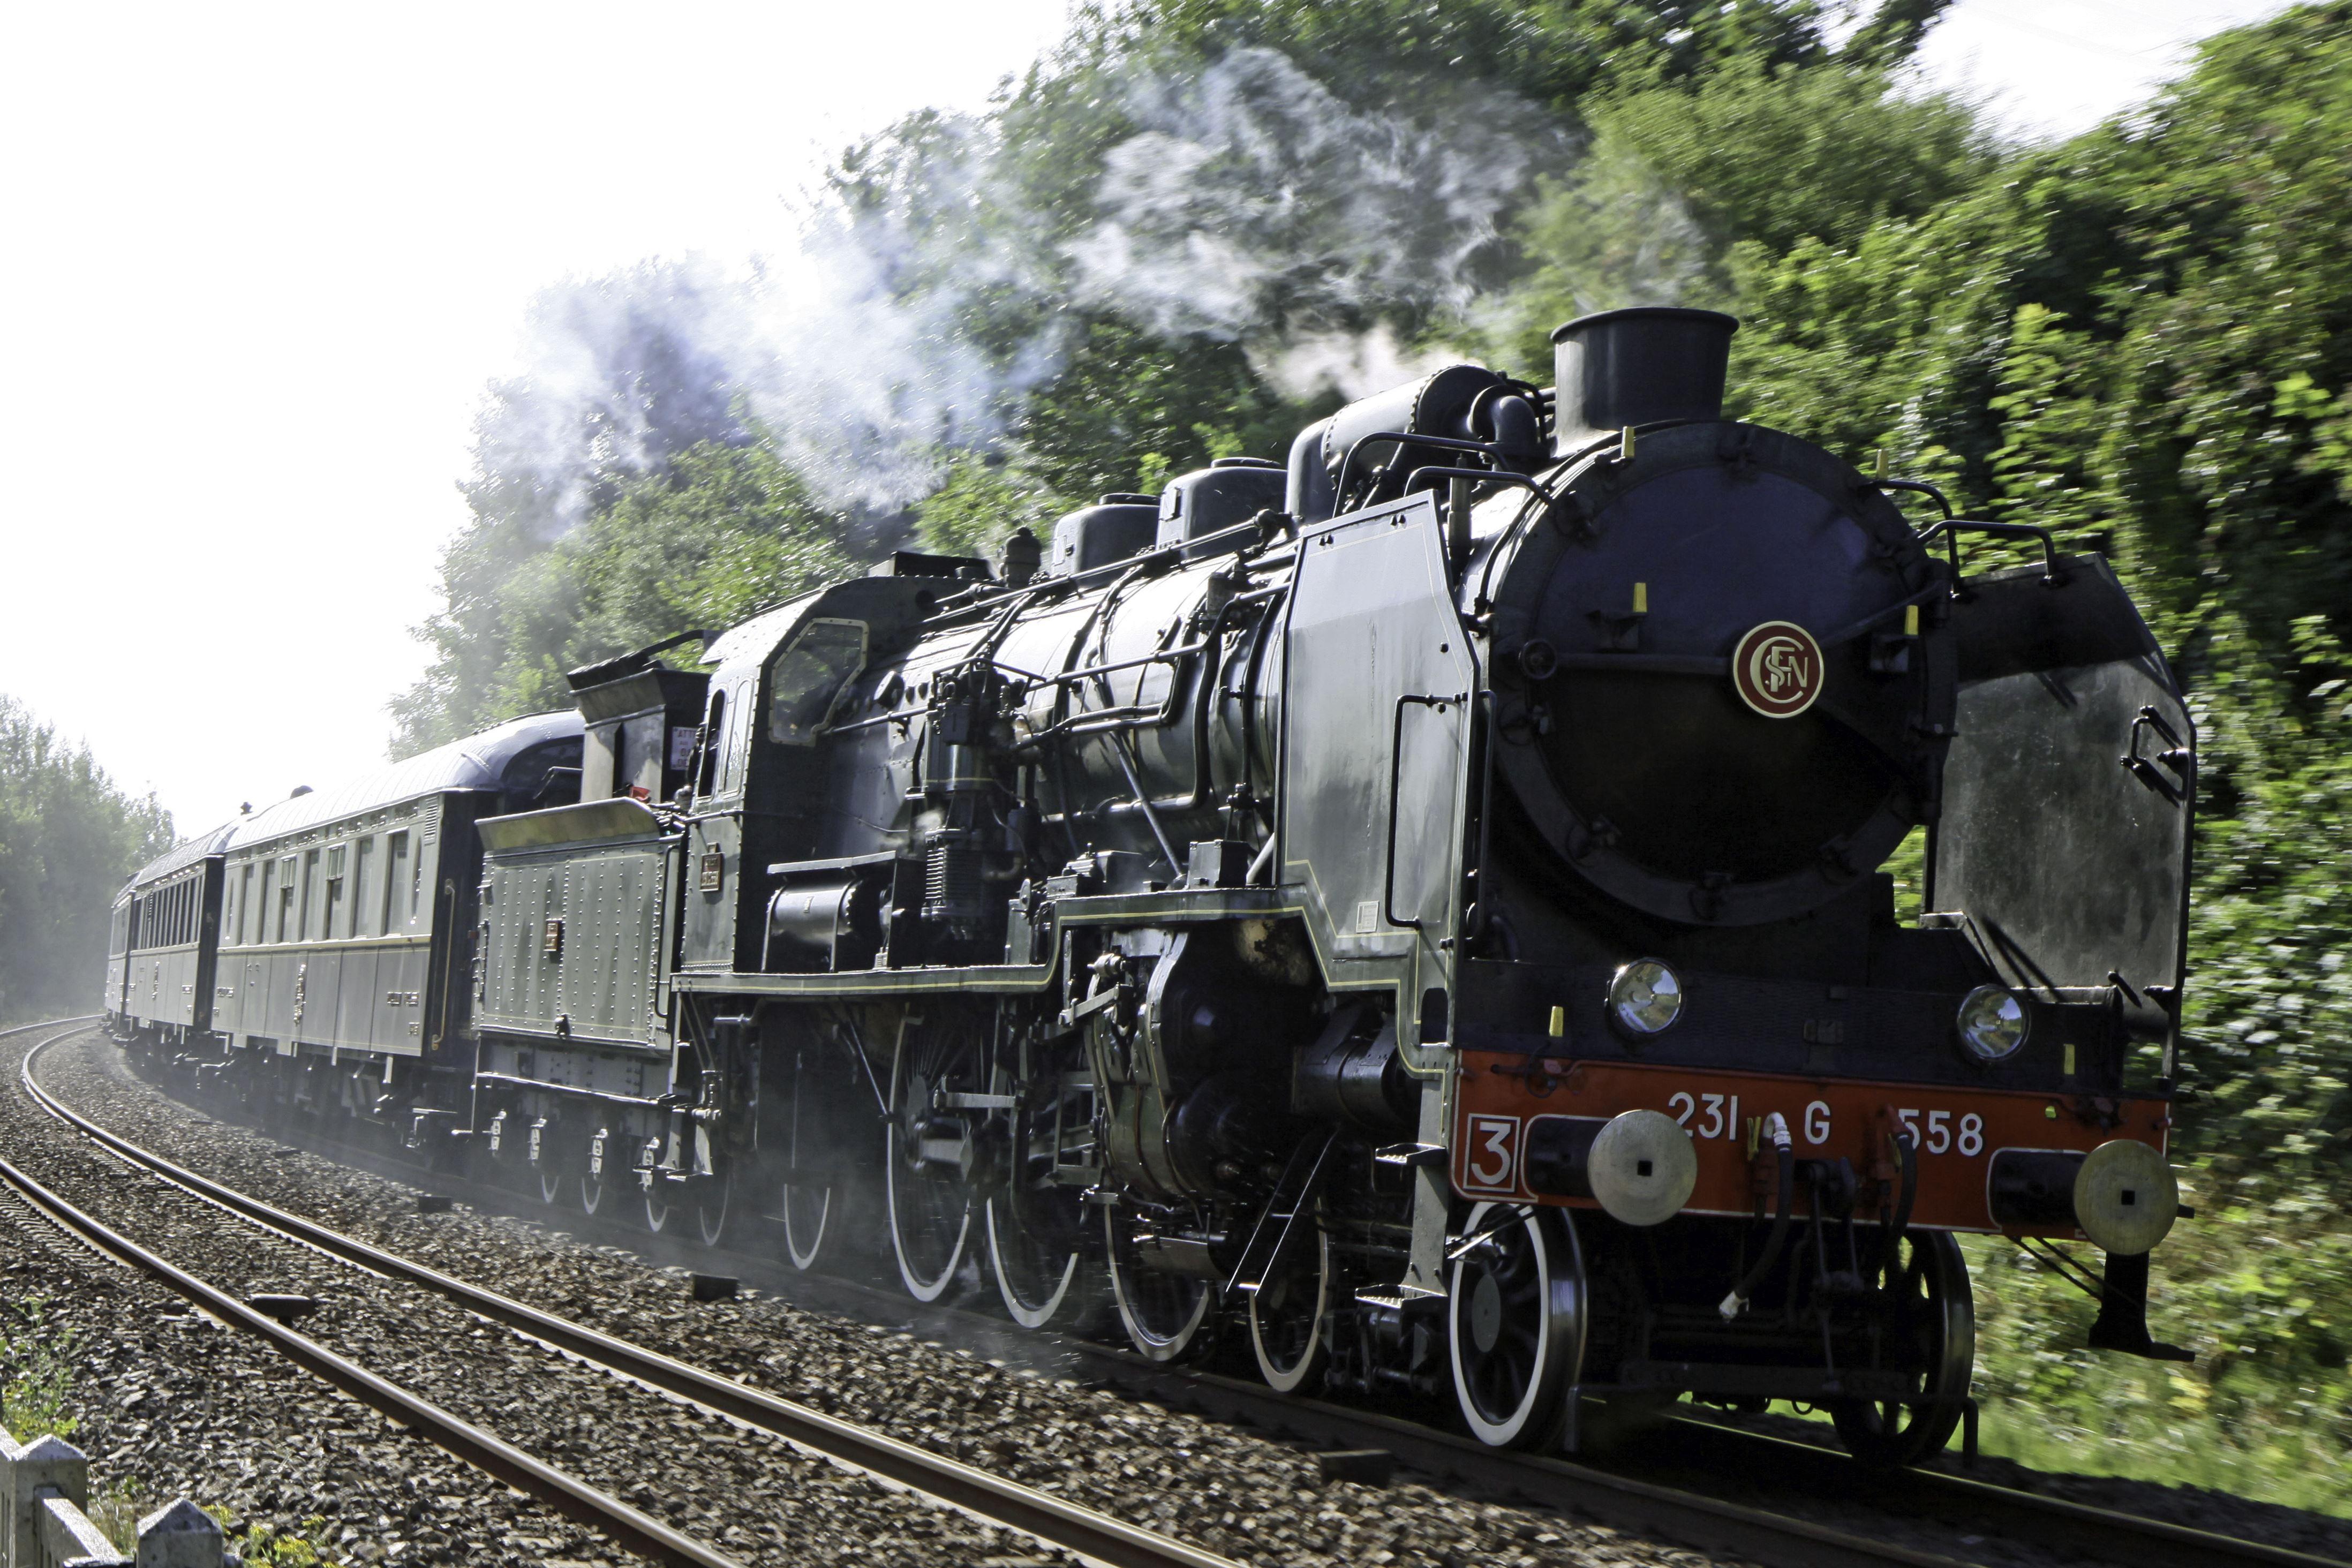 Pacific Orient Express, rêve d'un jour - Samedi 23 mars